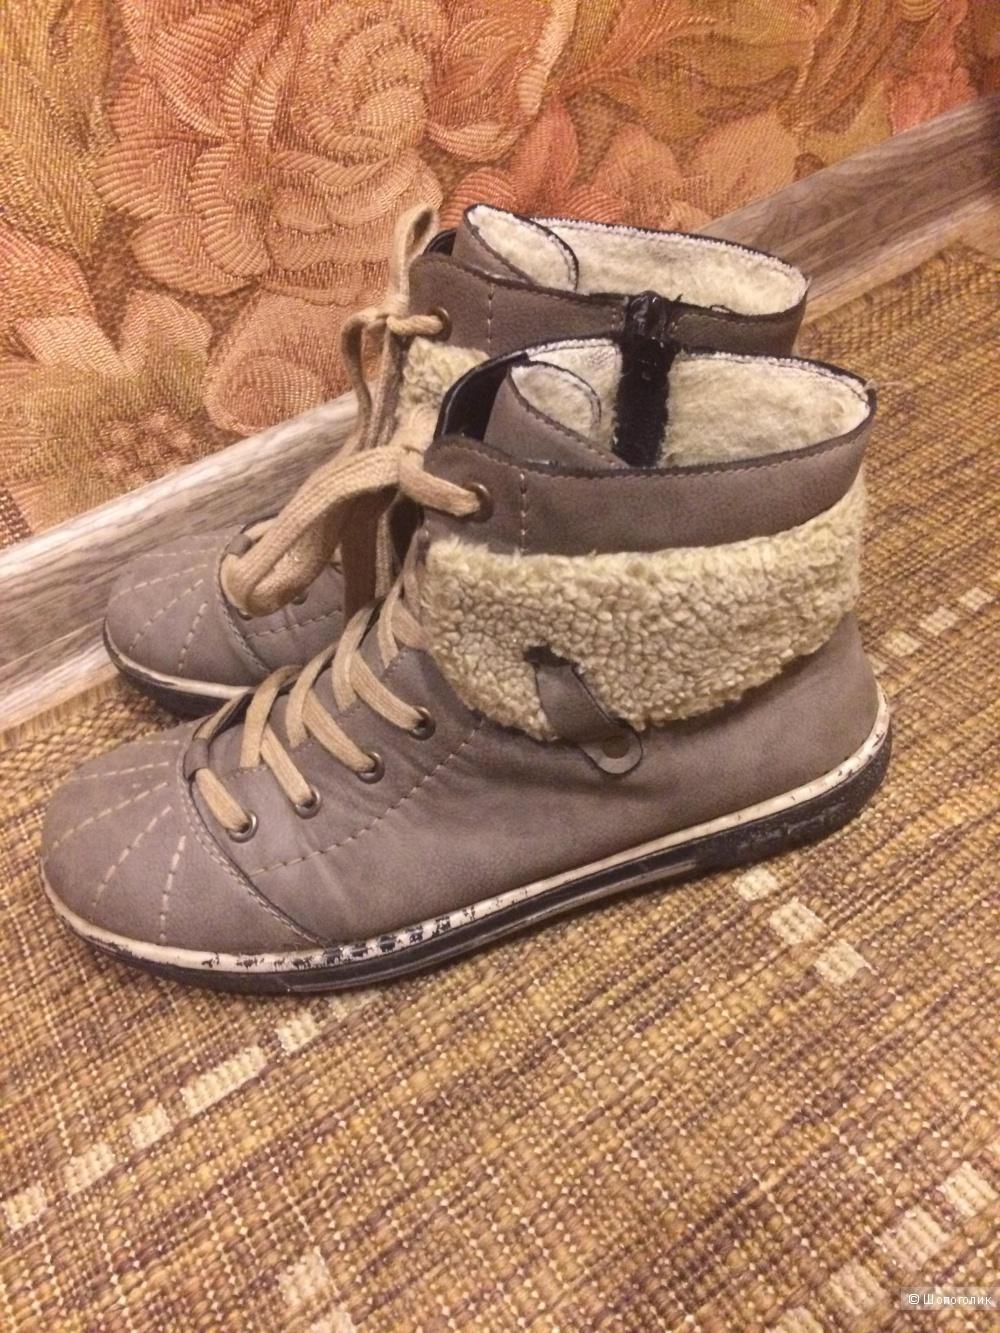 2e8701e0b Зимние женские ботинки Rieker, 38 р., в магазине Другой магазин — на ...